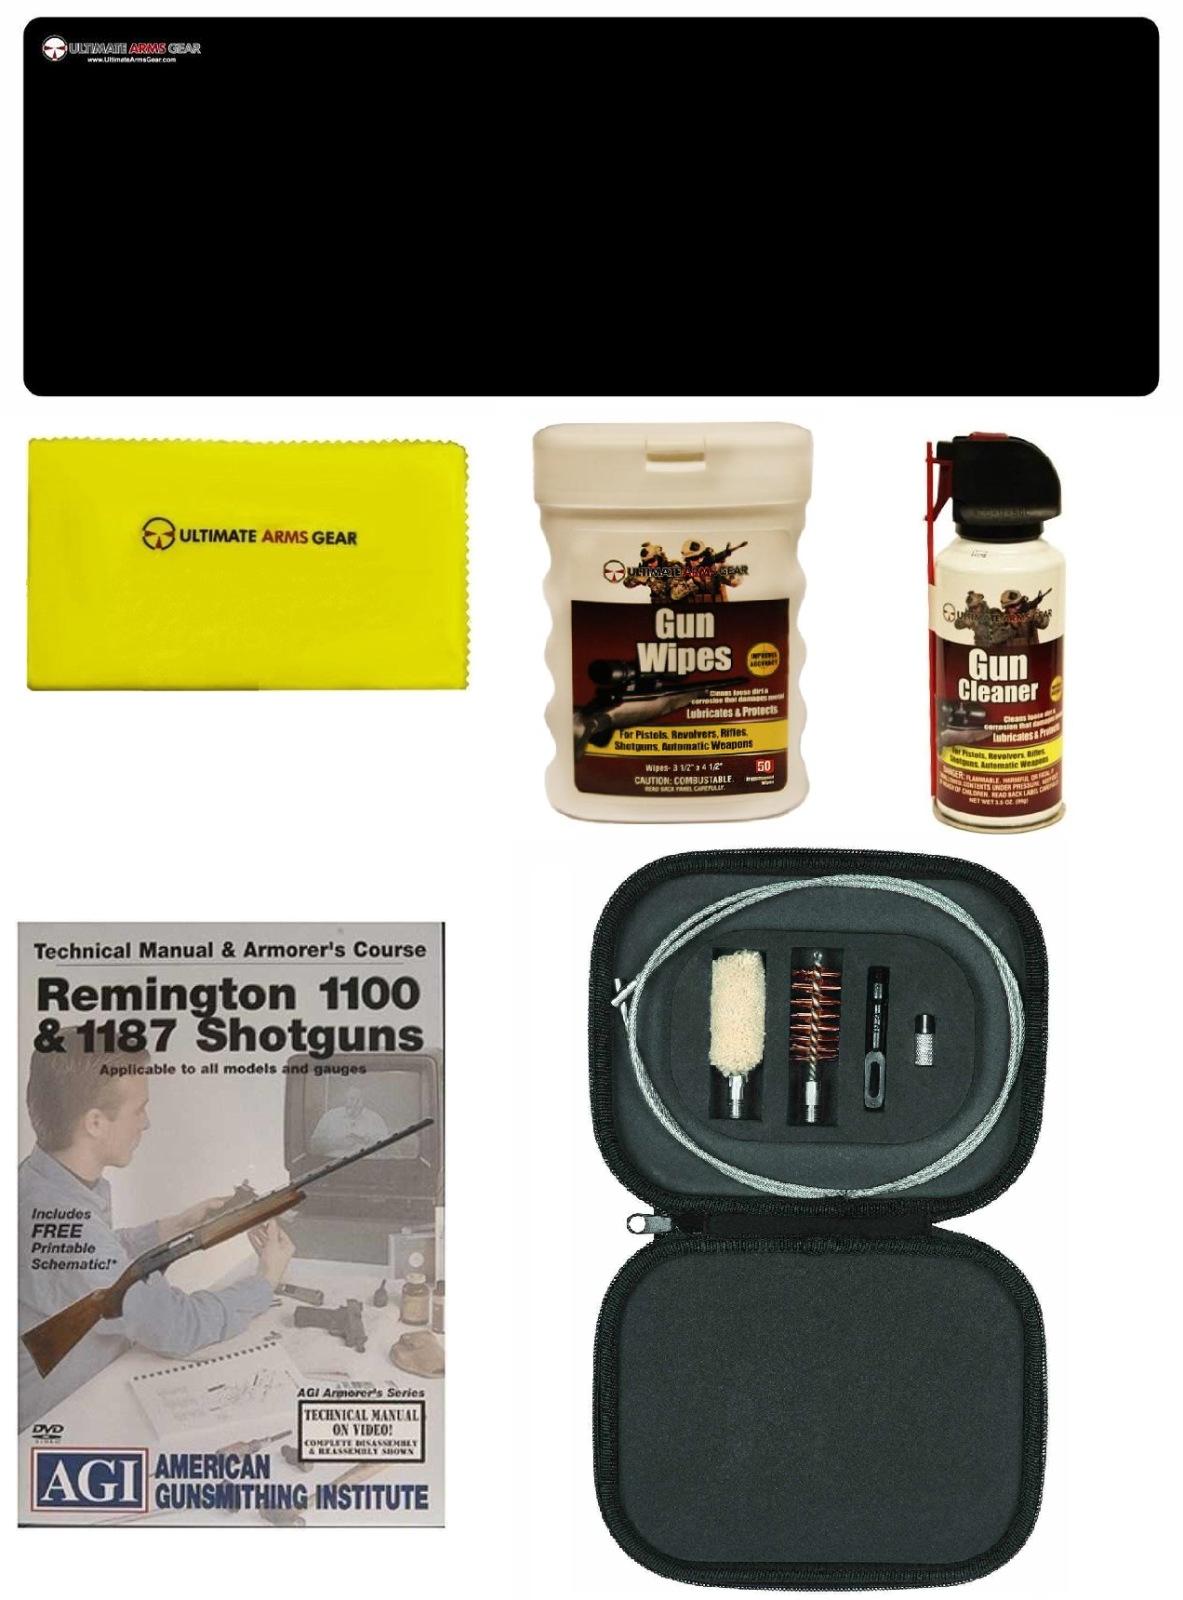 AGI DVD Manual & Armorer Course Remington 1100 1187 Shotgun + Ultimate Arms Gear Gunsmith Bench Gun Mat + 12 GA Cleaning... by